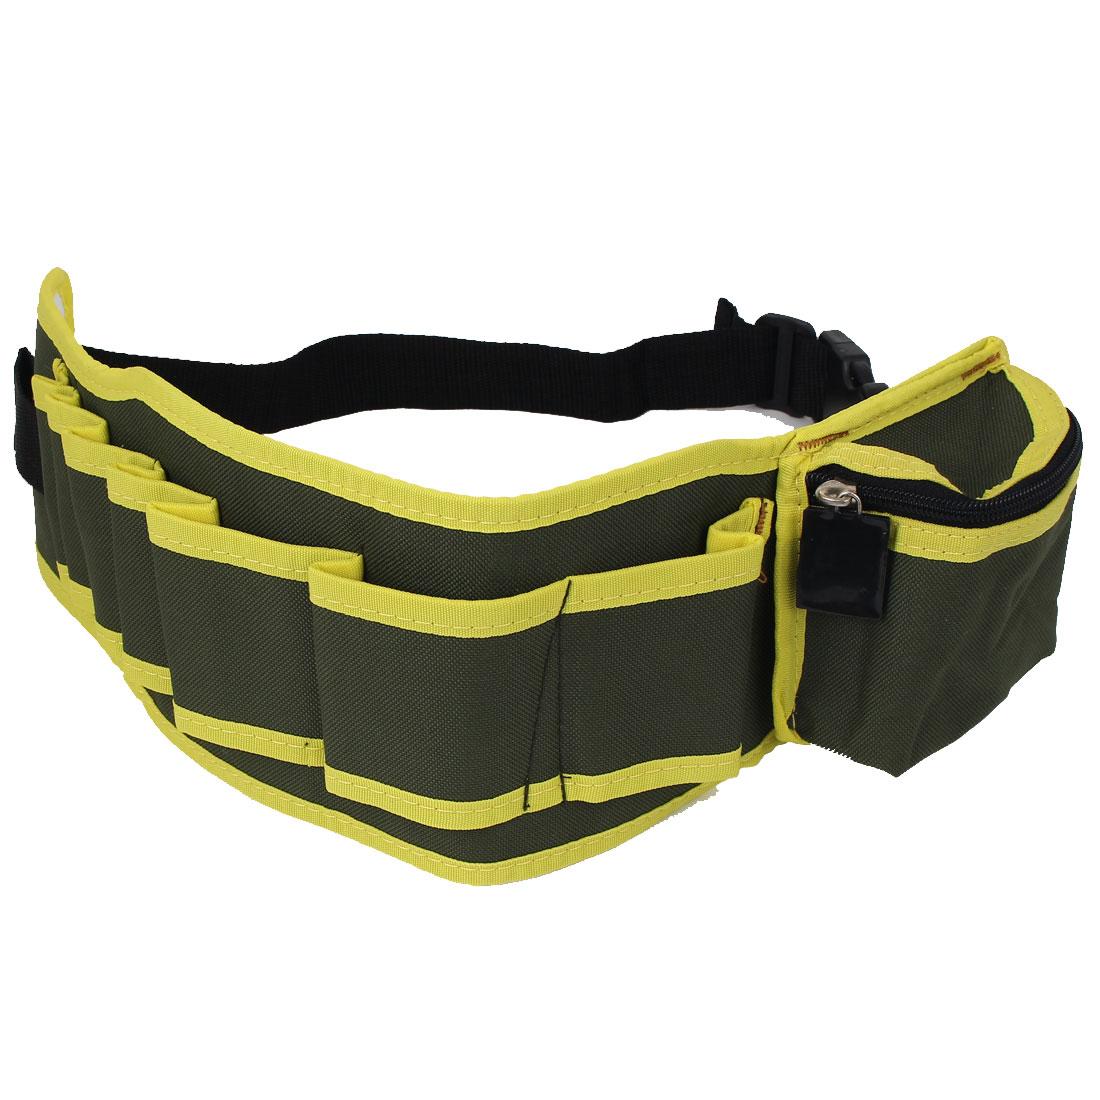 Electrician Adjustable Buckle Strap Pliers Scissors Tool Waist Belt Bag